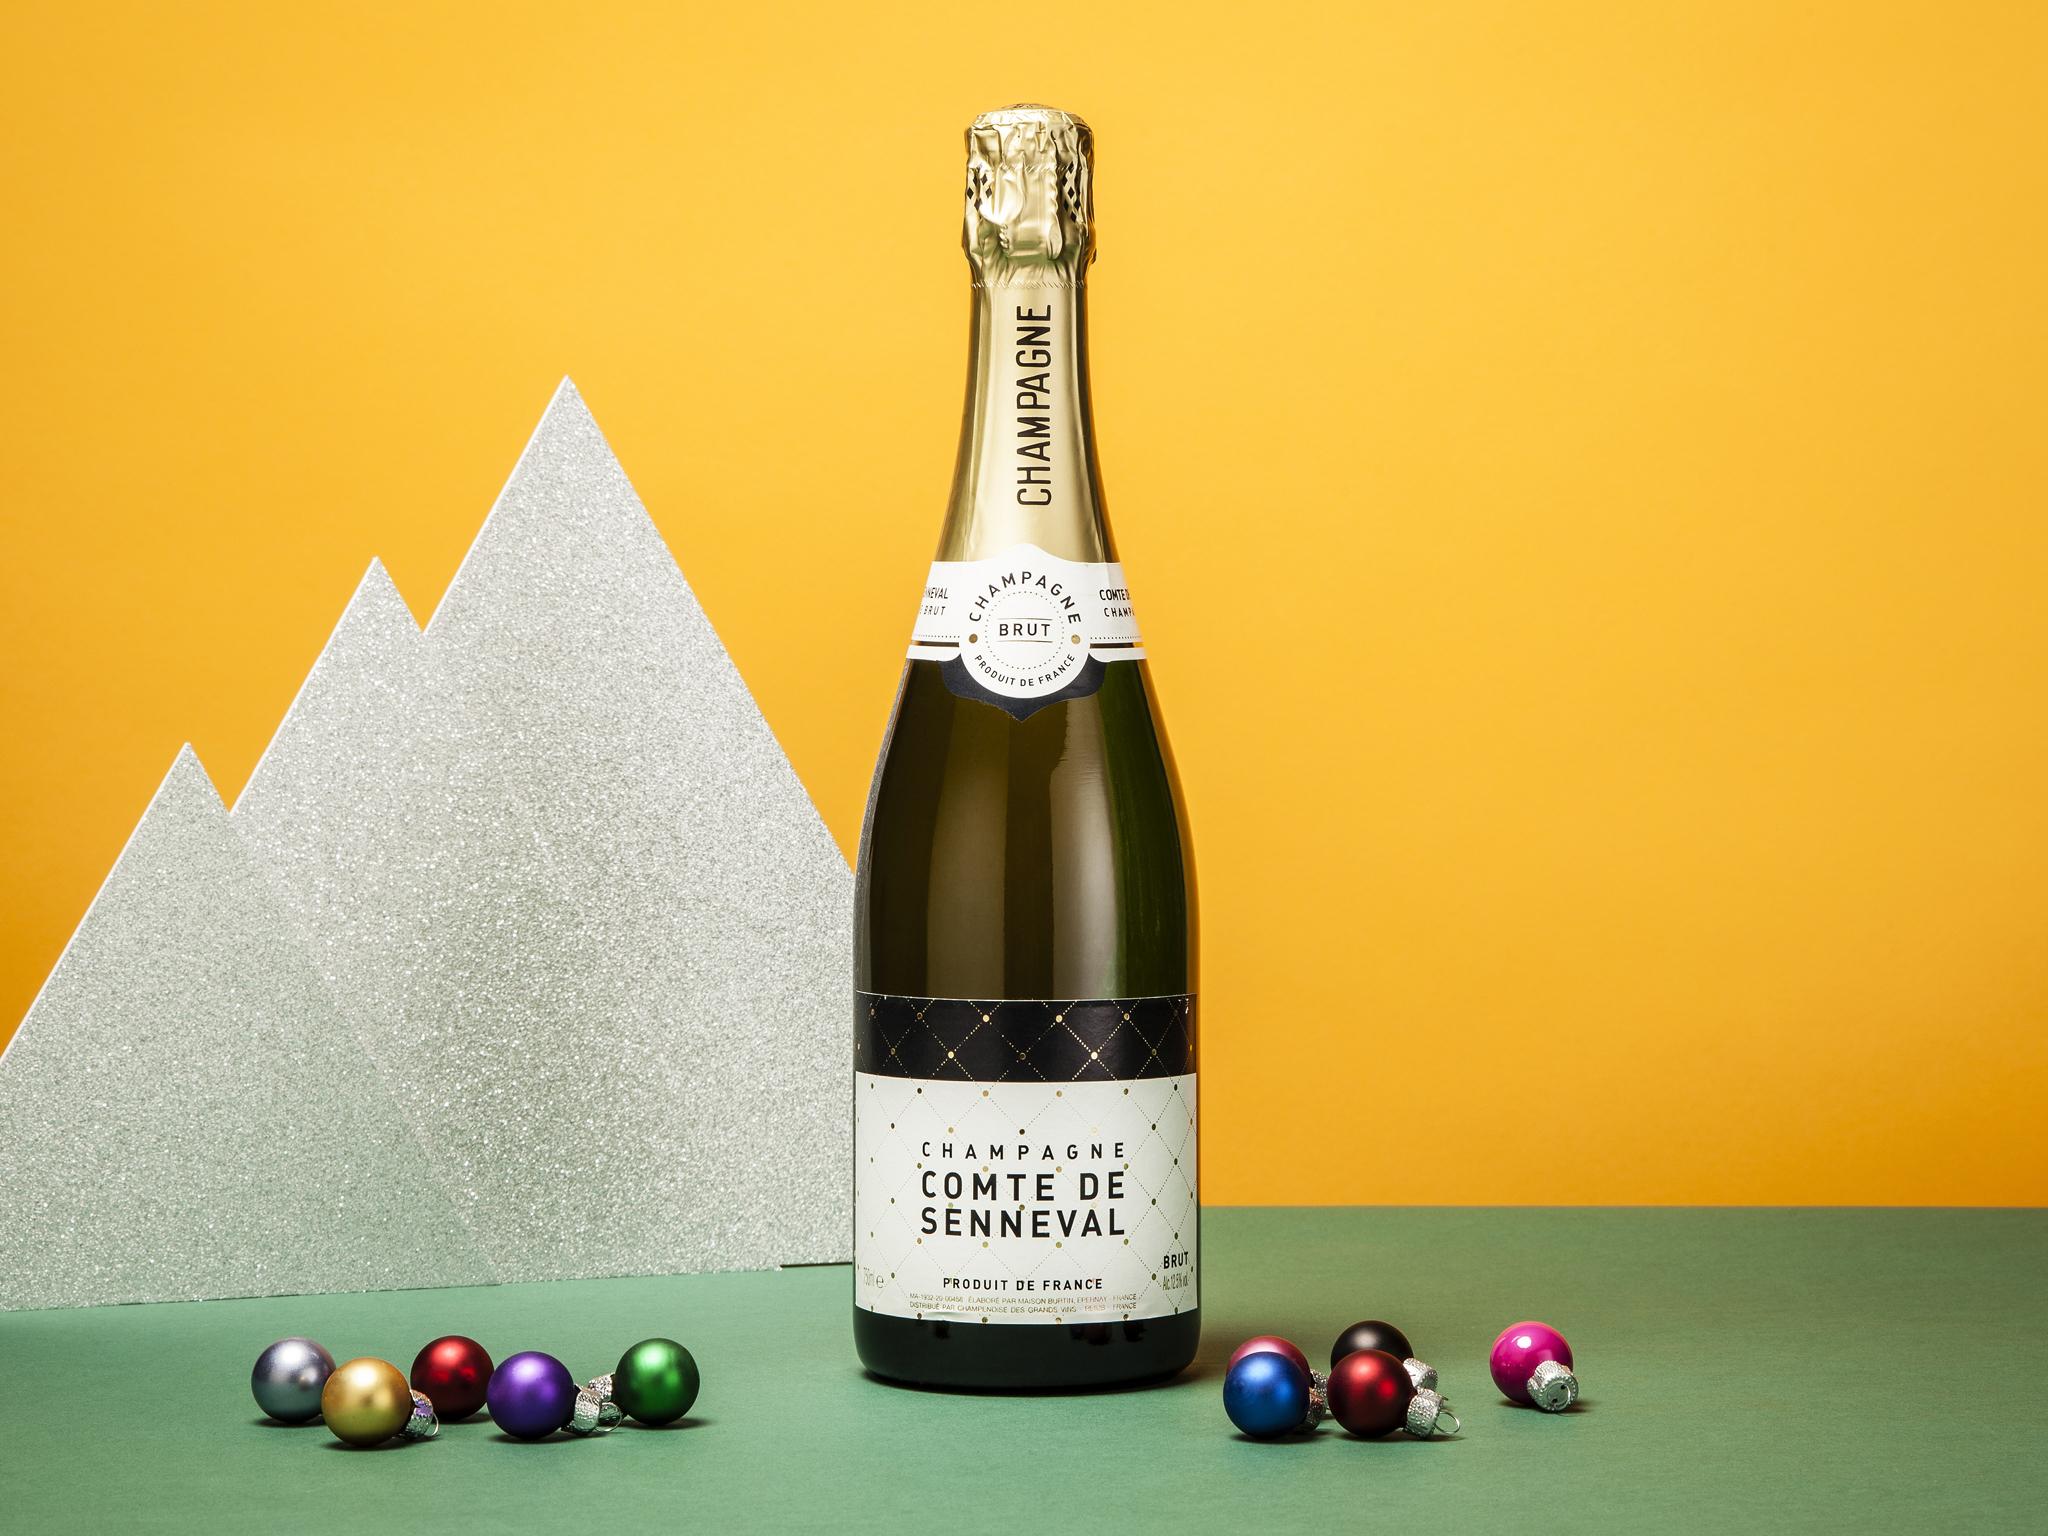 budget champagne best cheap supermarket bottles time out london. Black Bedroom Furniture Sets. Home Design Ideas